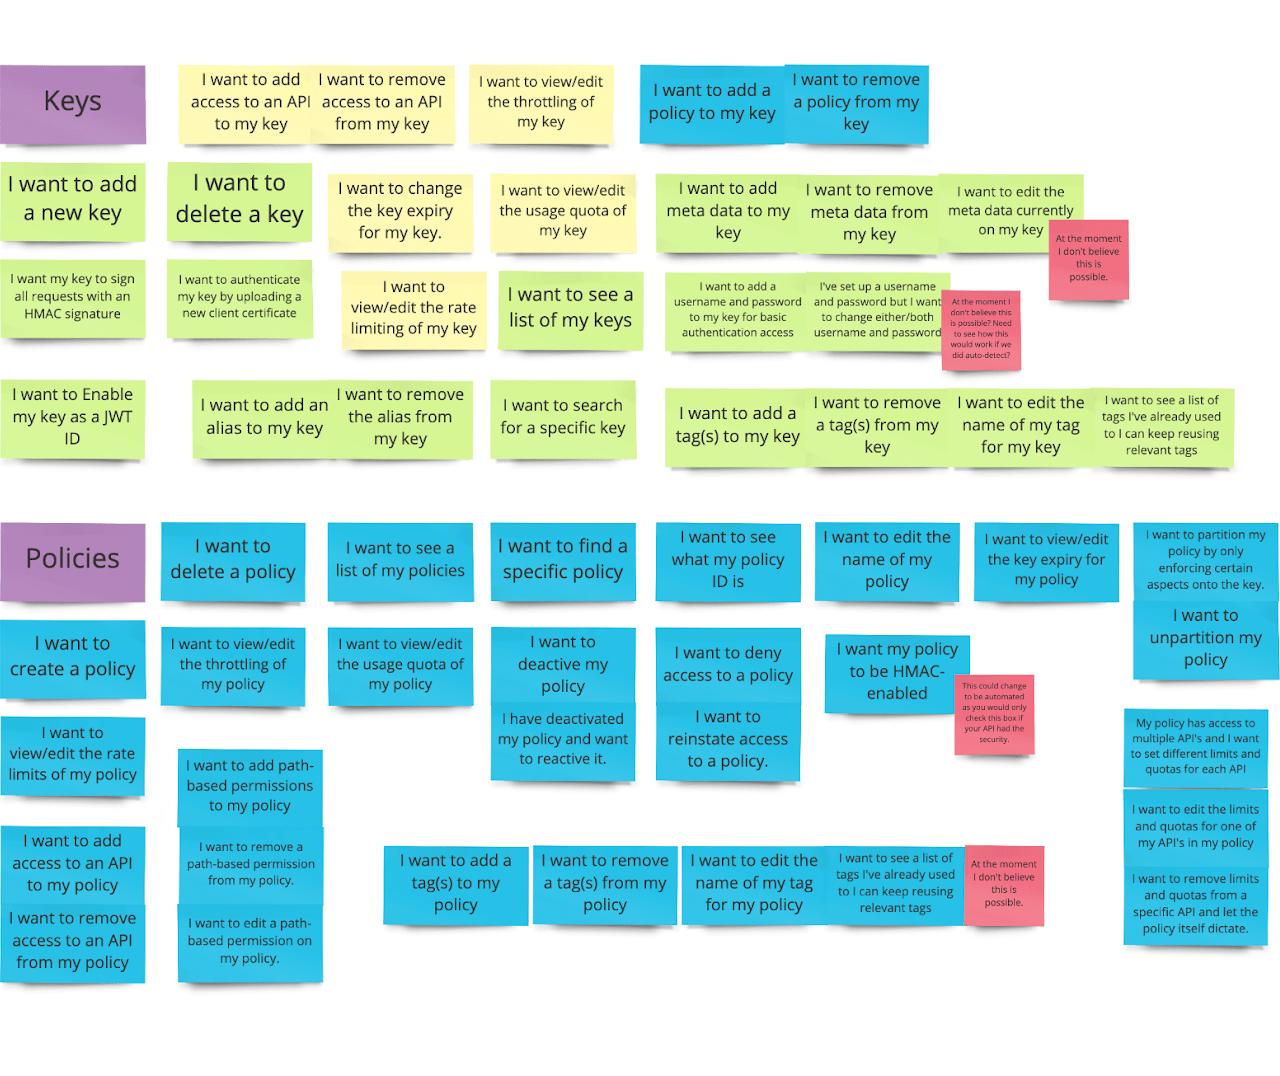 User goals documented